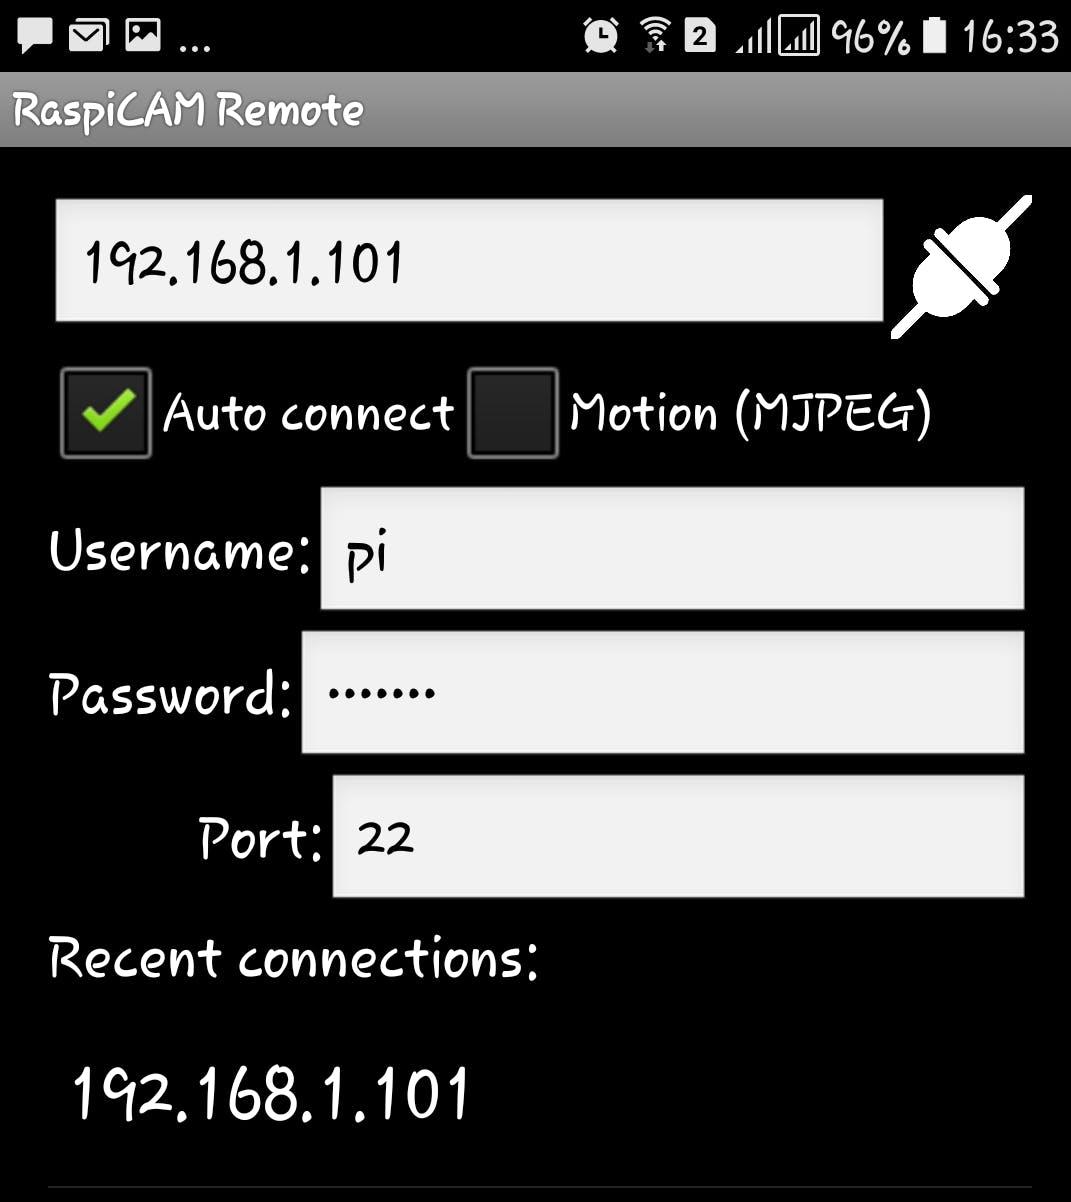 RaspiCam Remote Mobile App